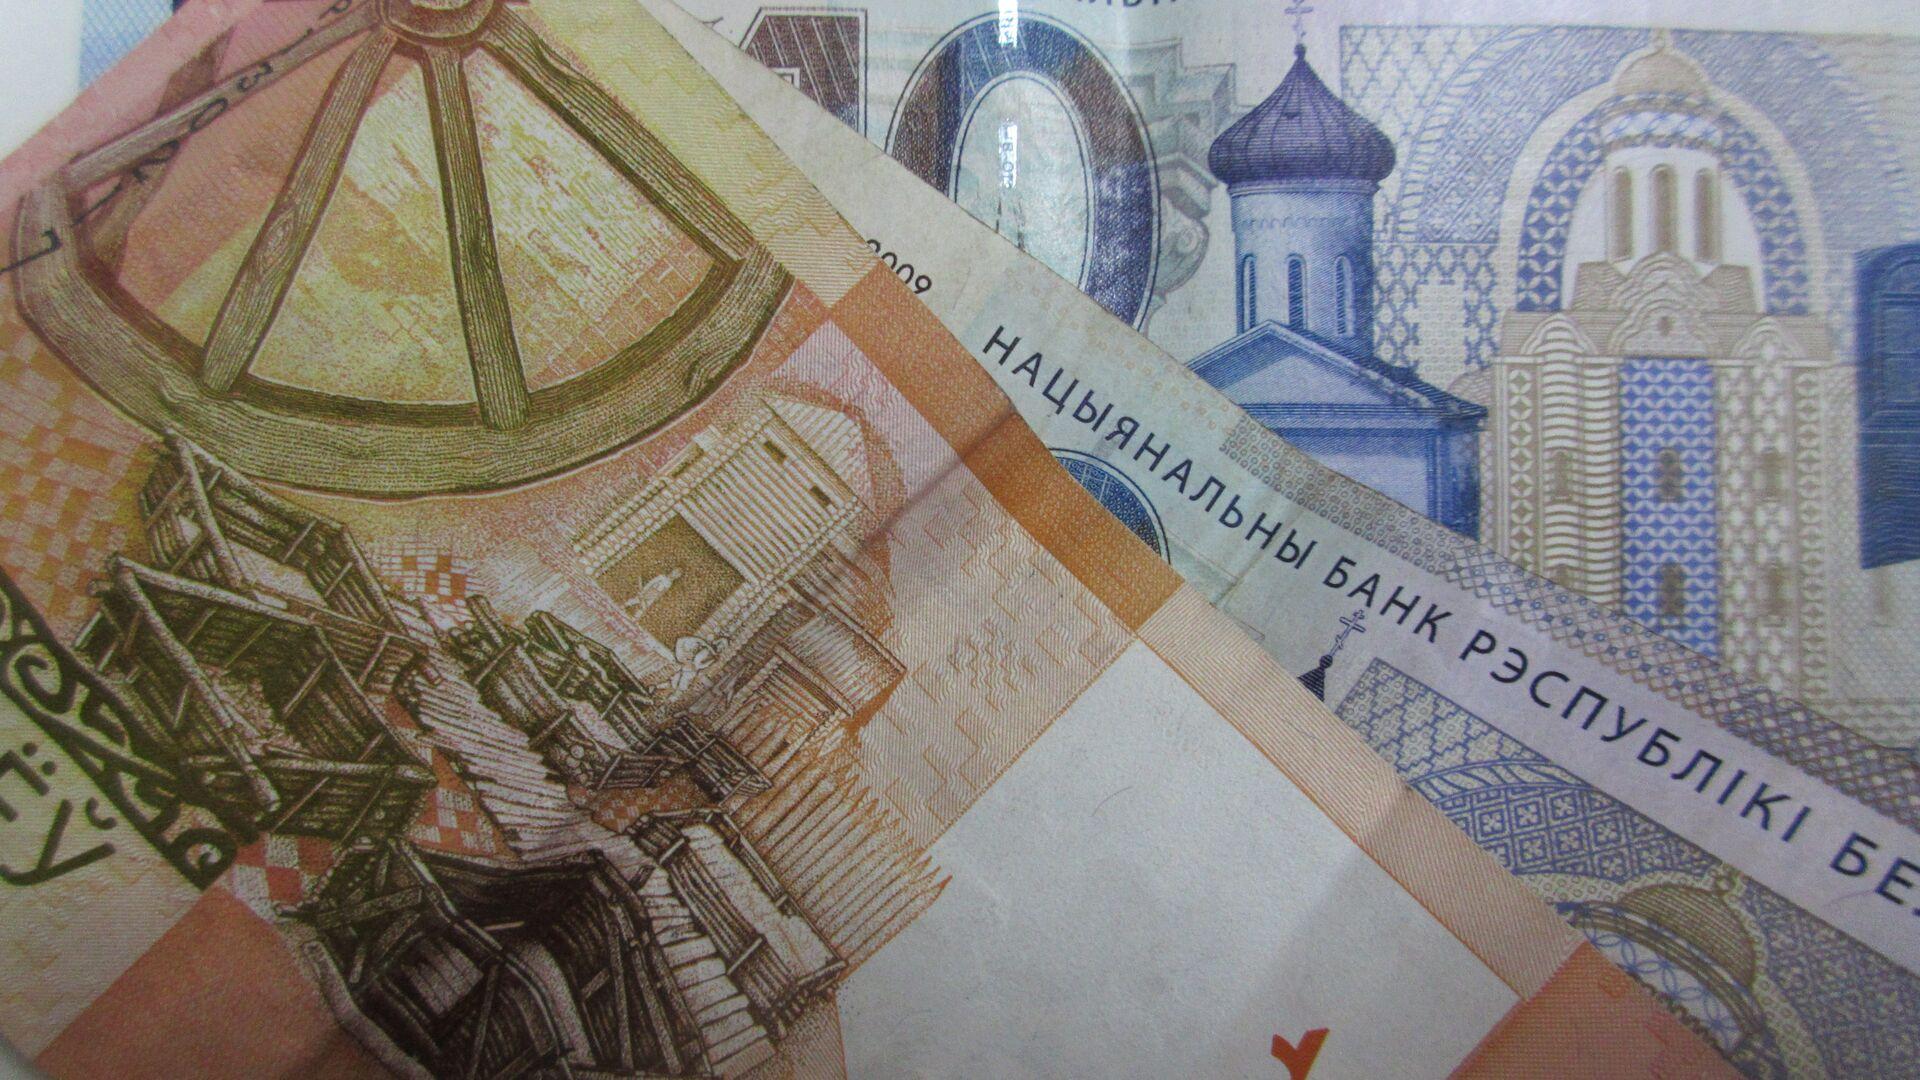 Беларускія грошы - Sputnik Беларусь, 1920, 15.07.2021